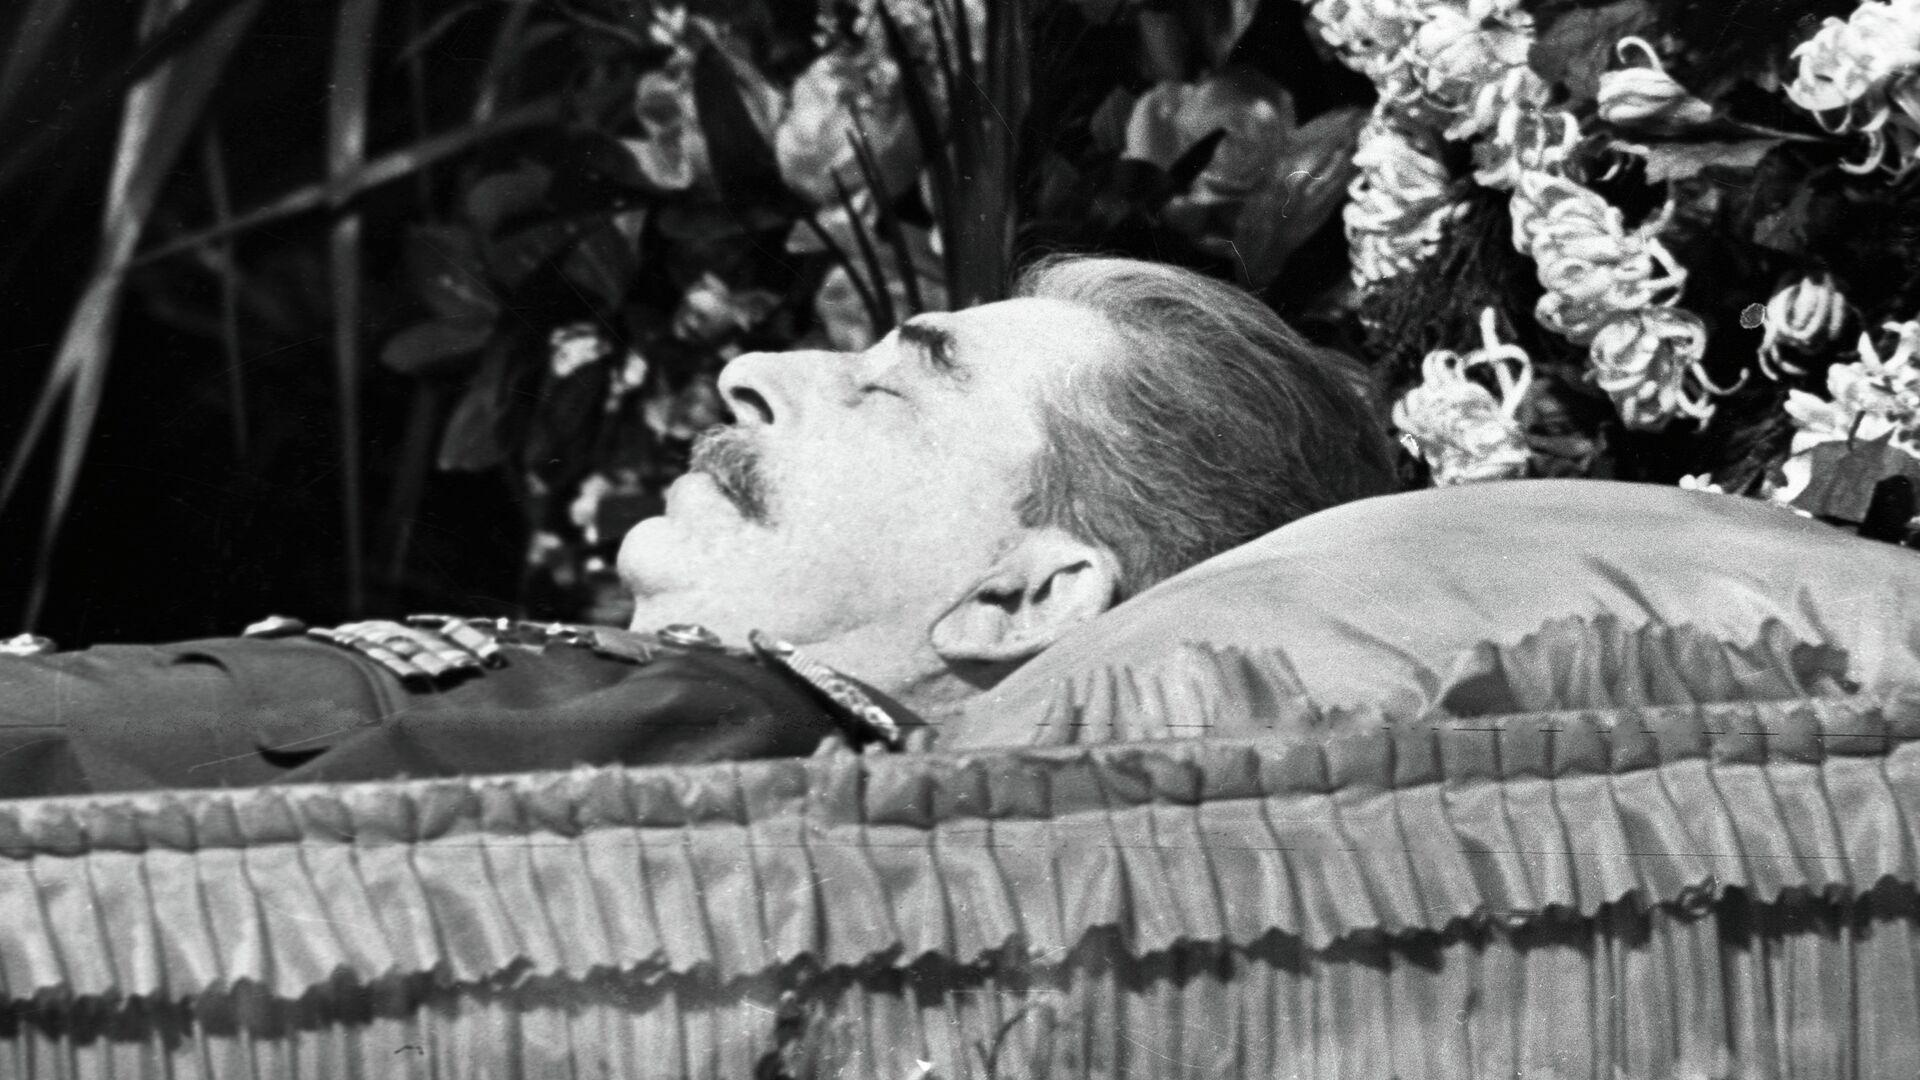 Иосиф Виссарионович Сталин в гробу - РИА Новости, 1920, 09.03.2021